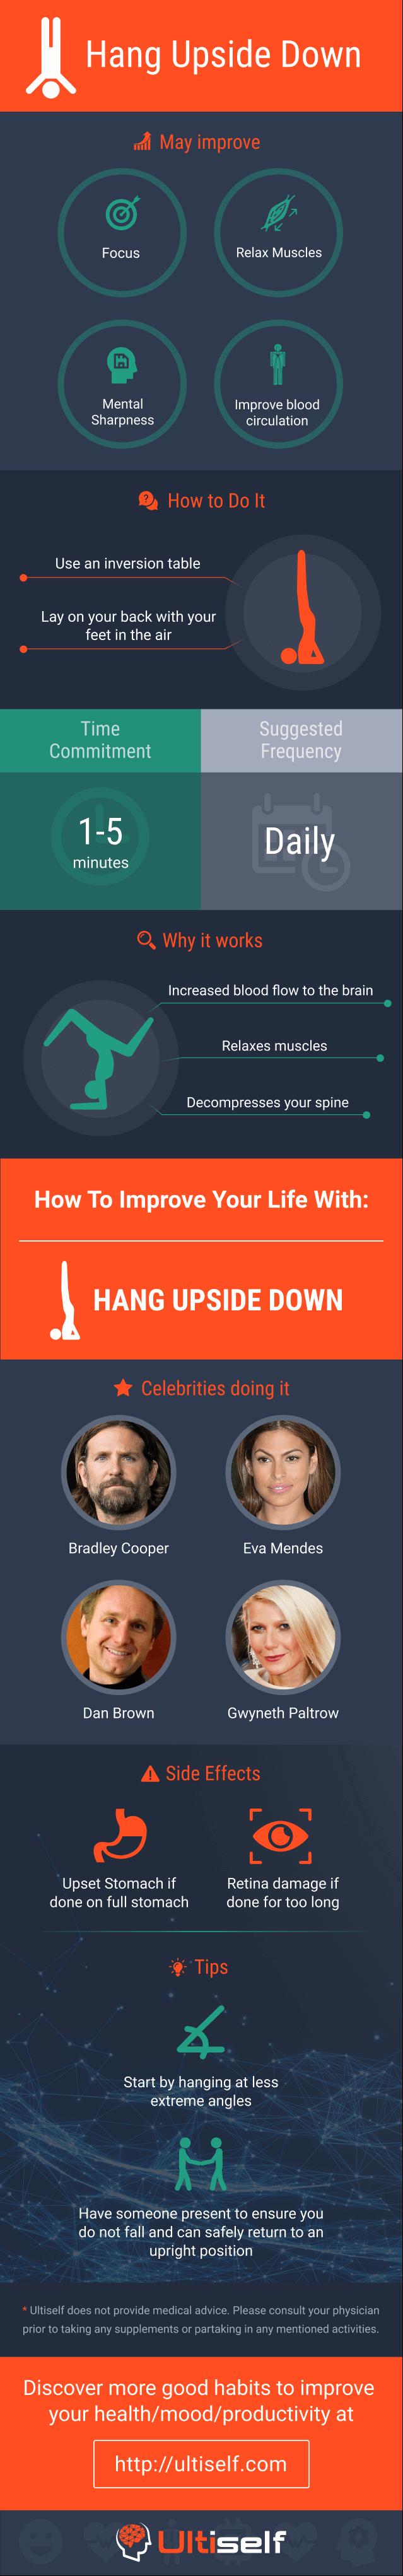 Hang upside down infographic